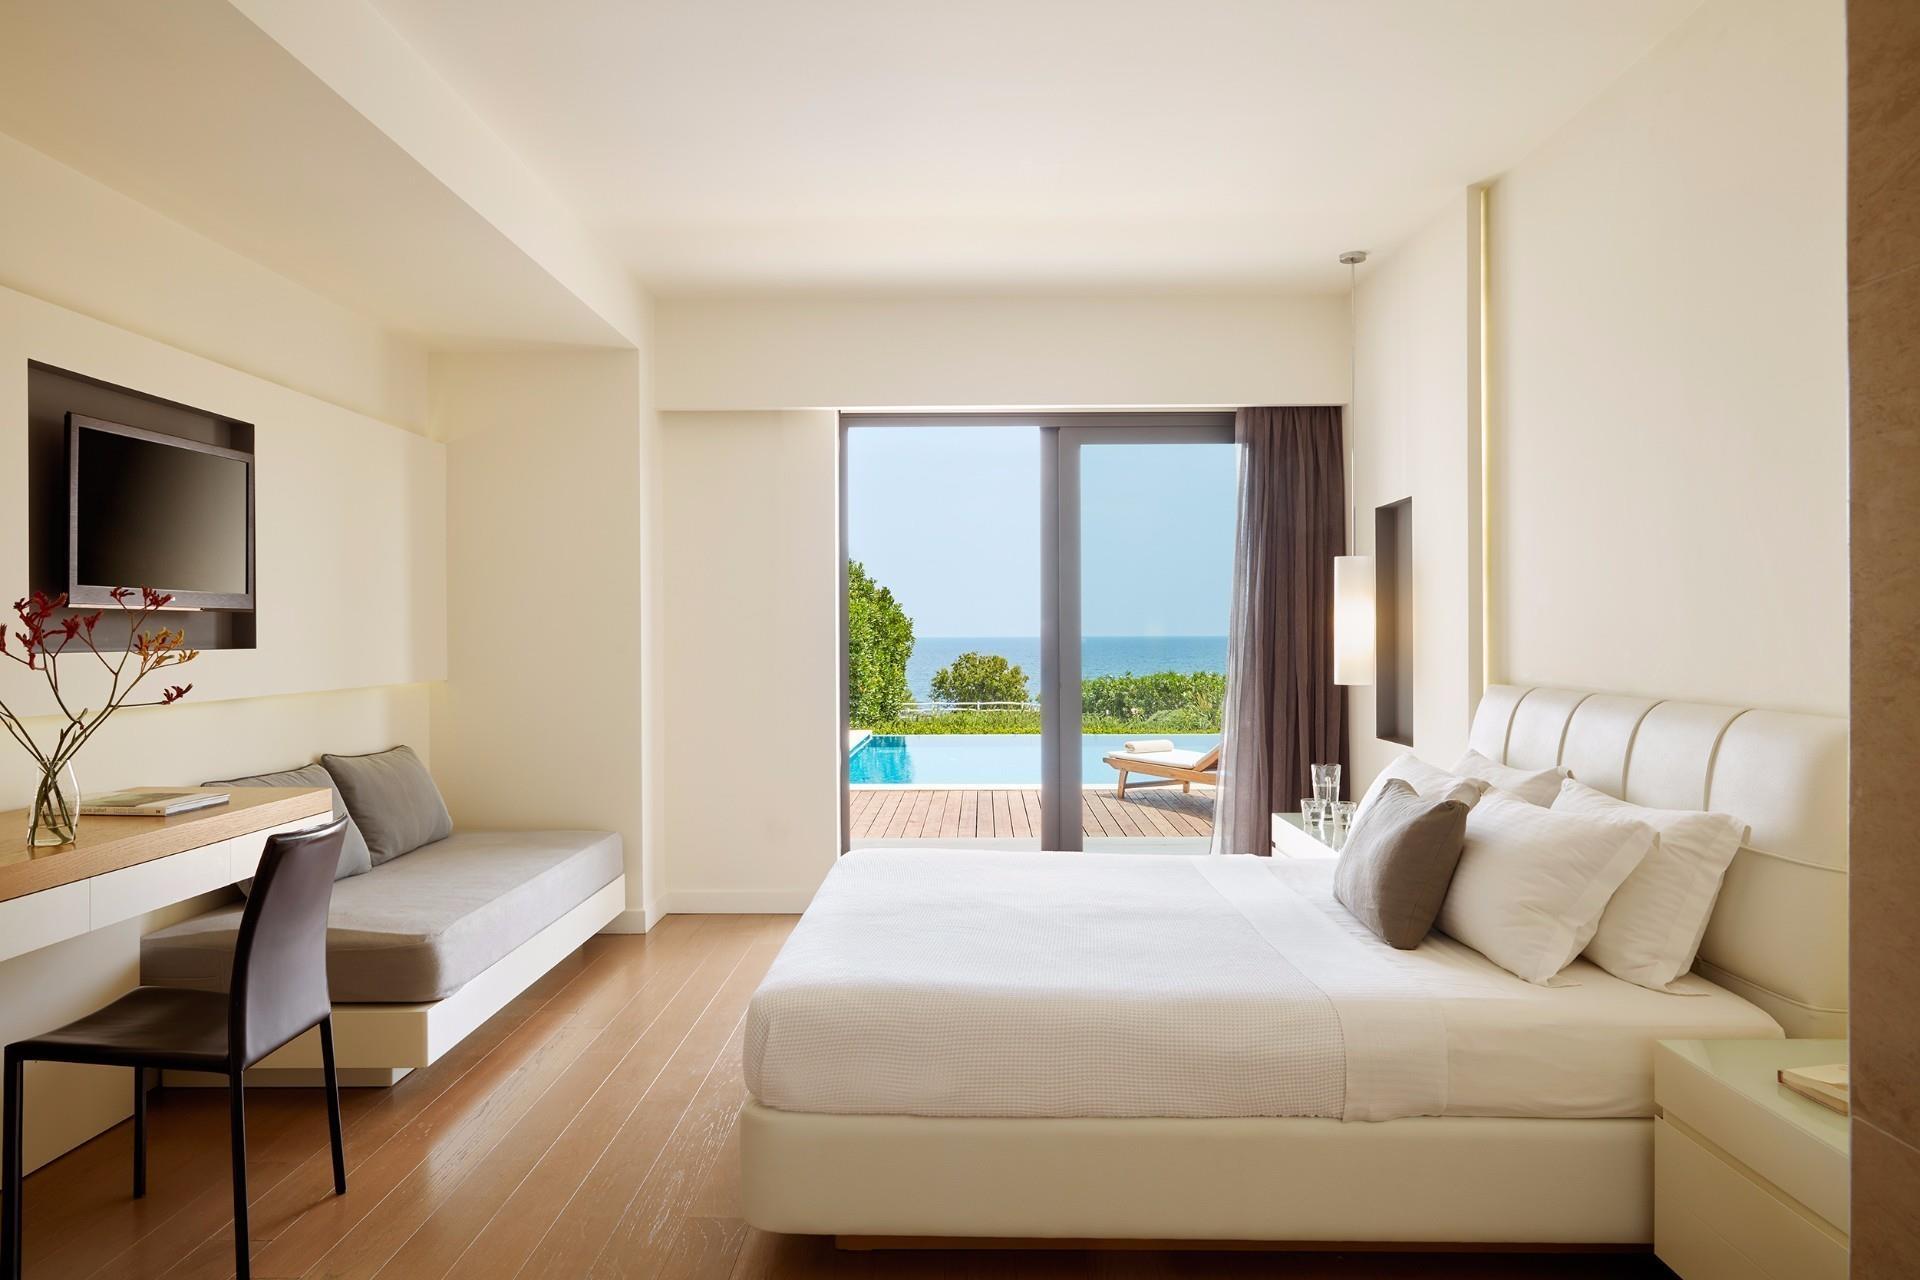 cavo-olympo-luxury-hotel-spa-genel-0011